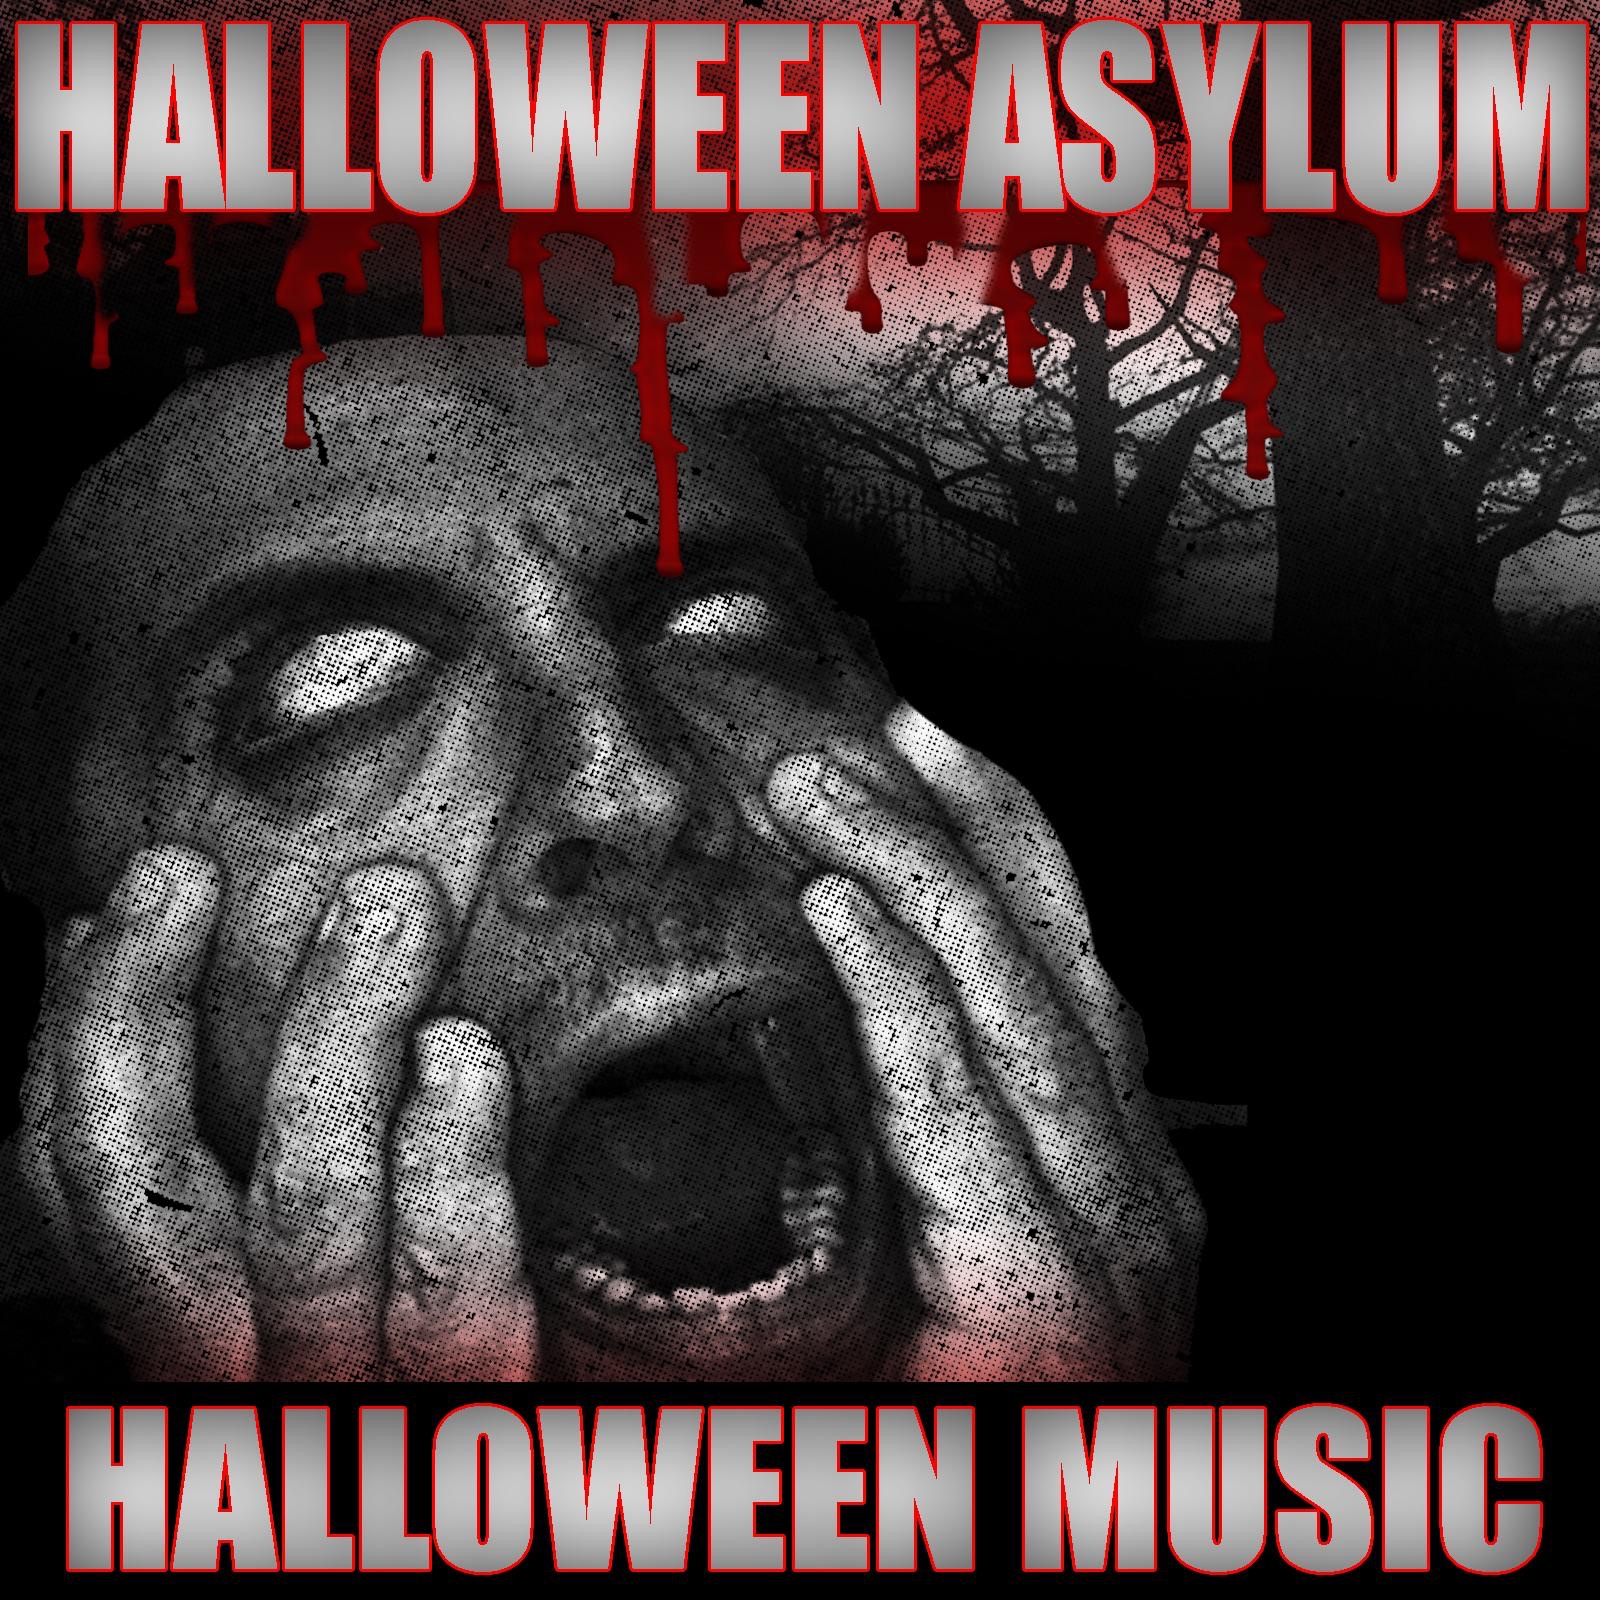 Halloween Never Ends